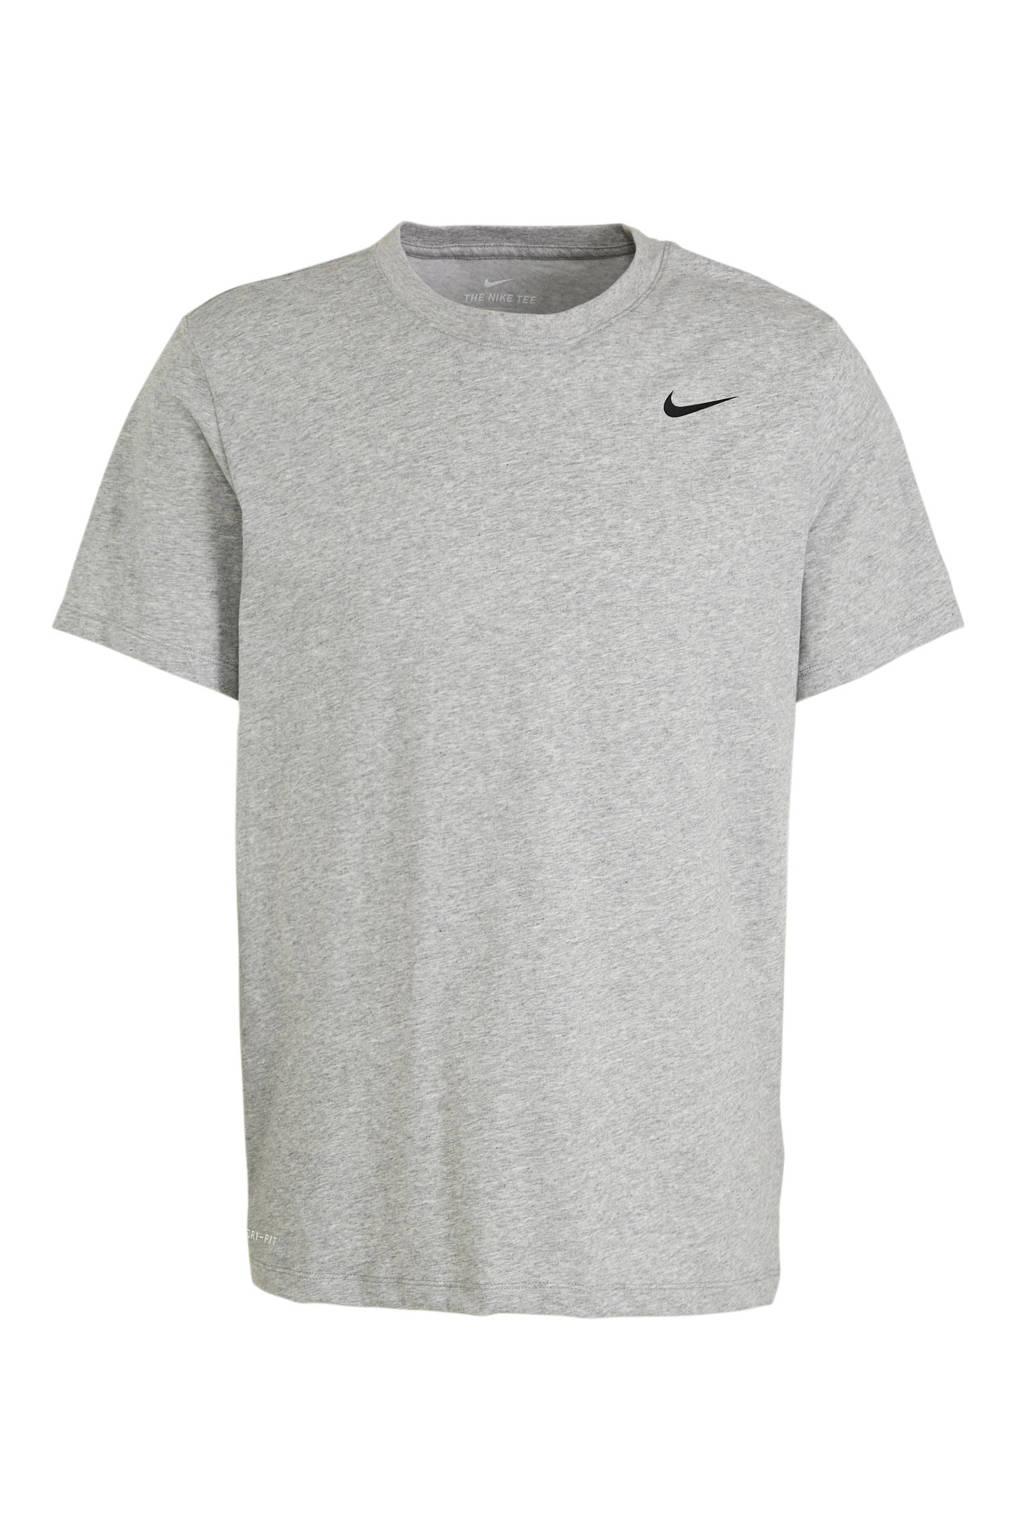 Nike   sport T-shirt grijs melange, Grijs